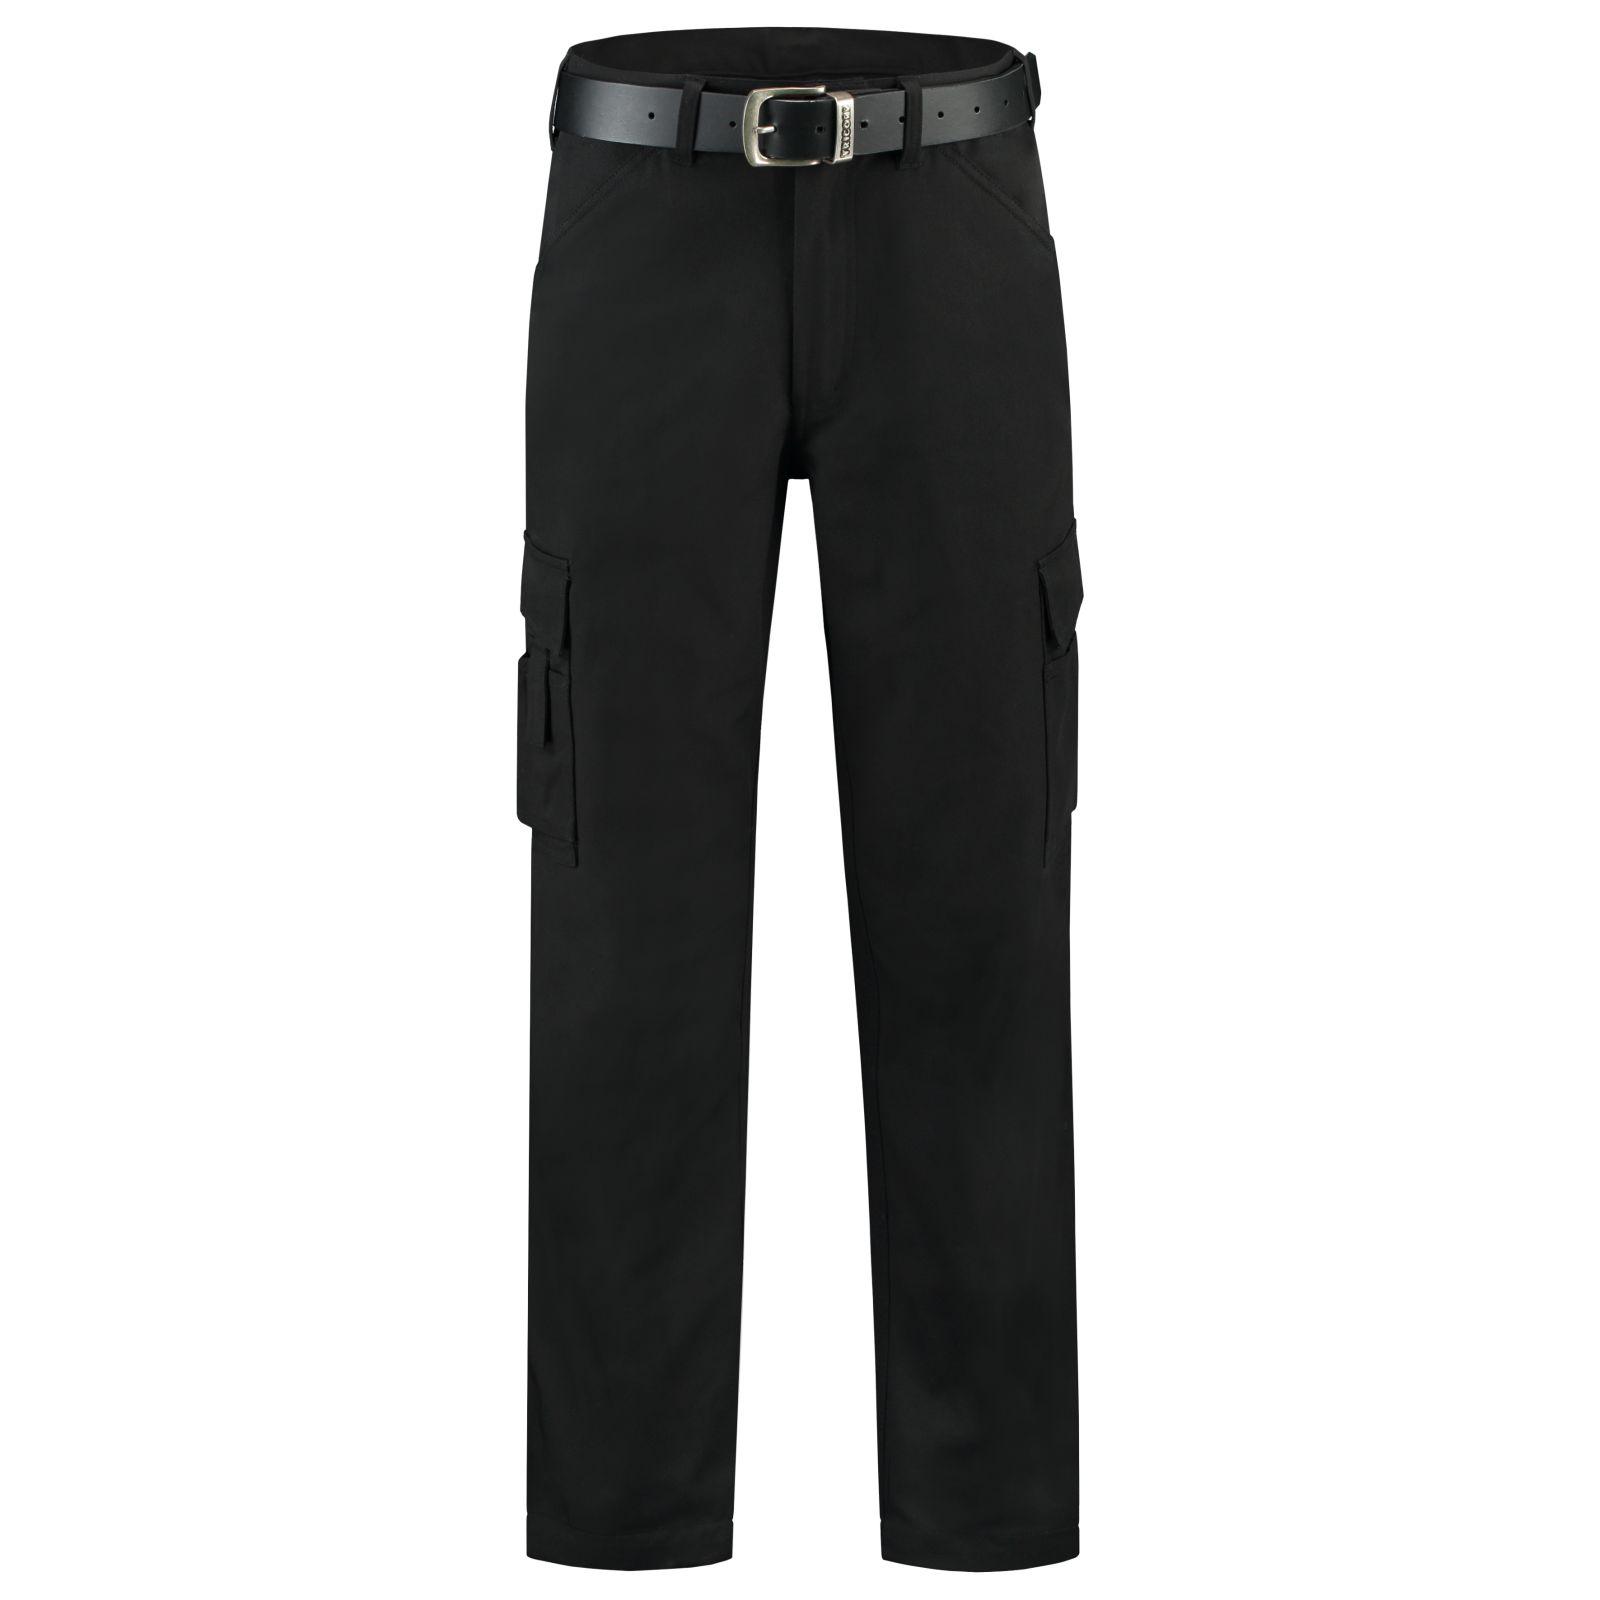 Tricorp Broeken 502010-TWO2000 zwart(Black)